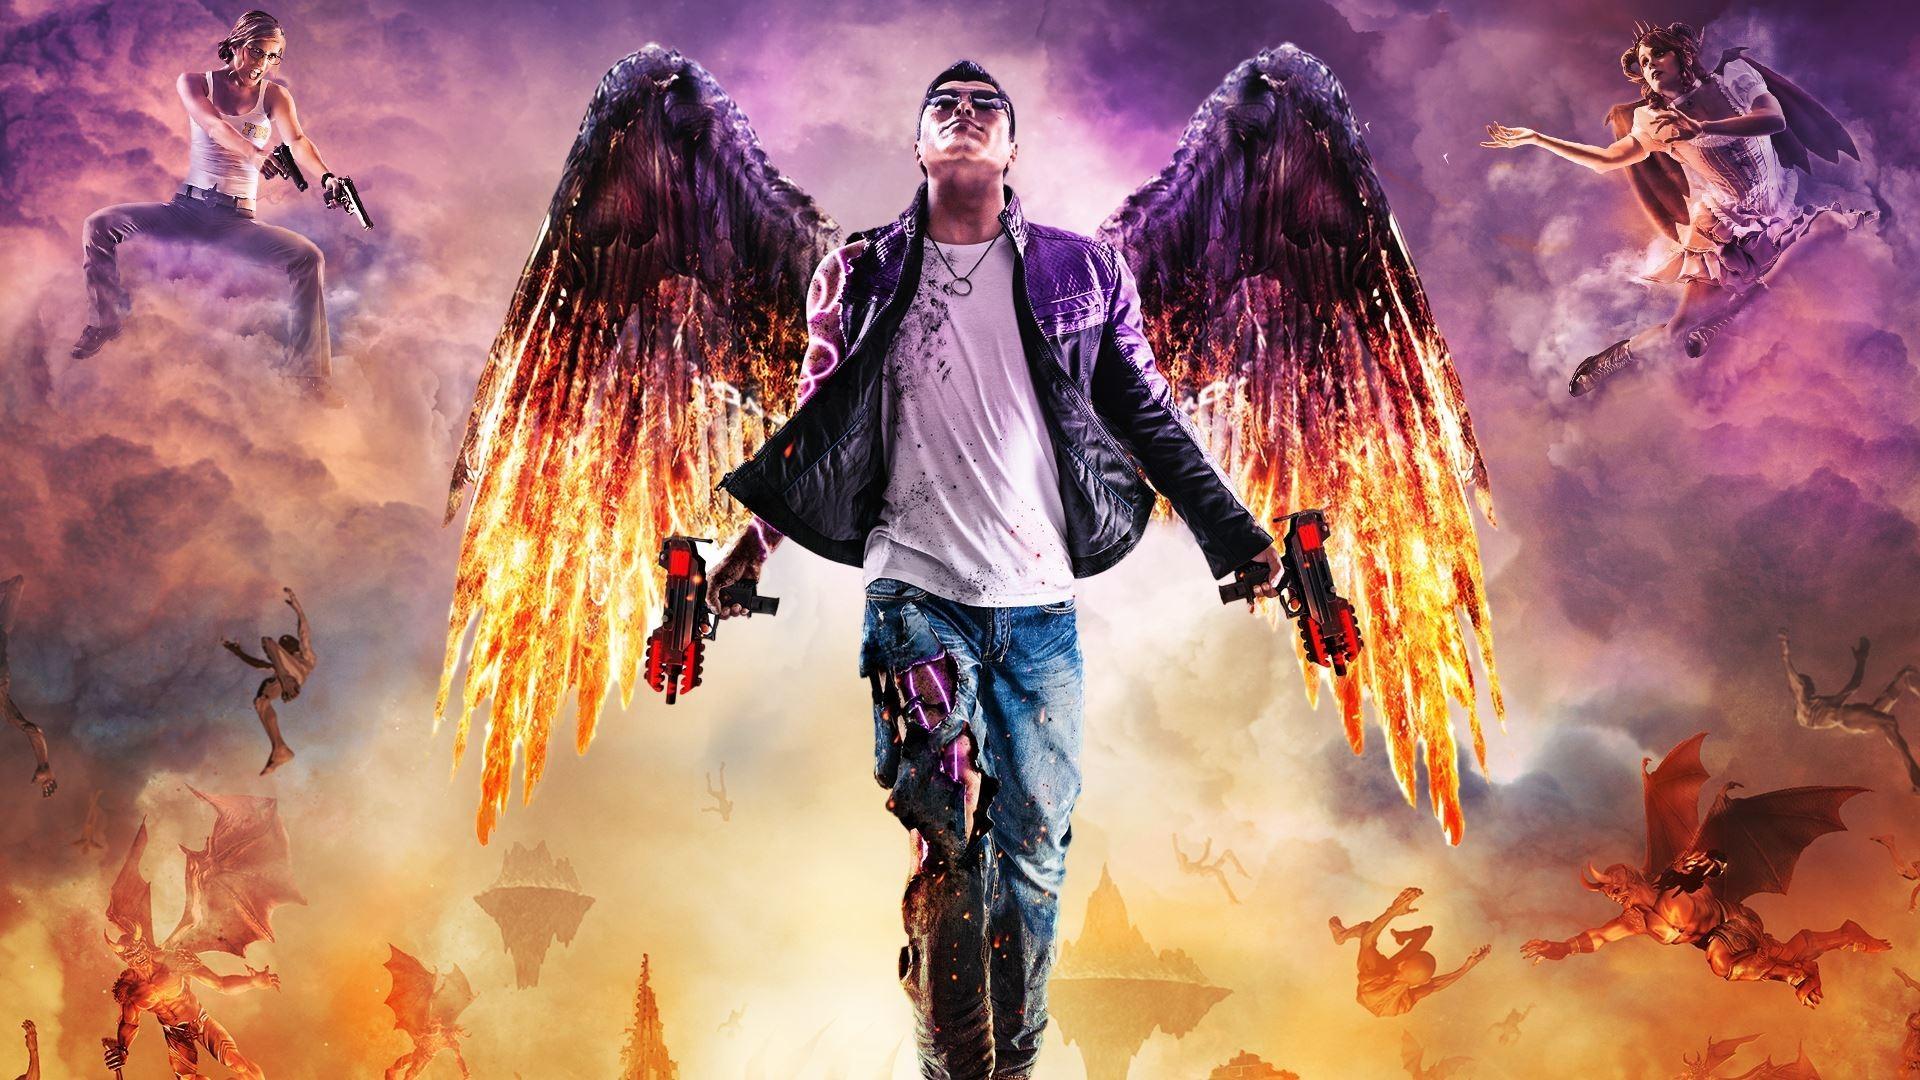 Wallpaper Digital Art Video Games Wings Fire Mythology